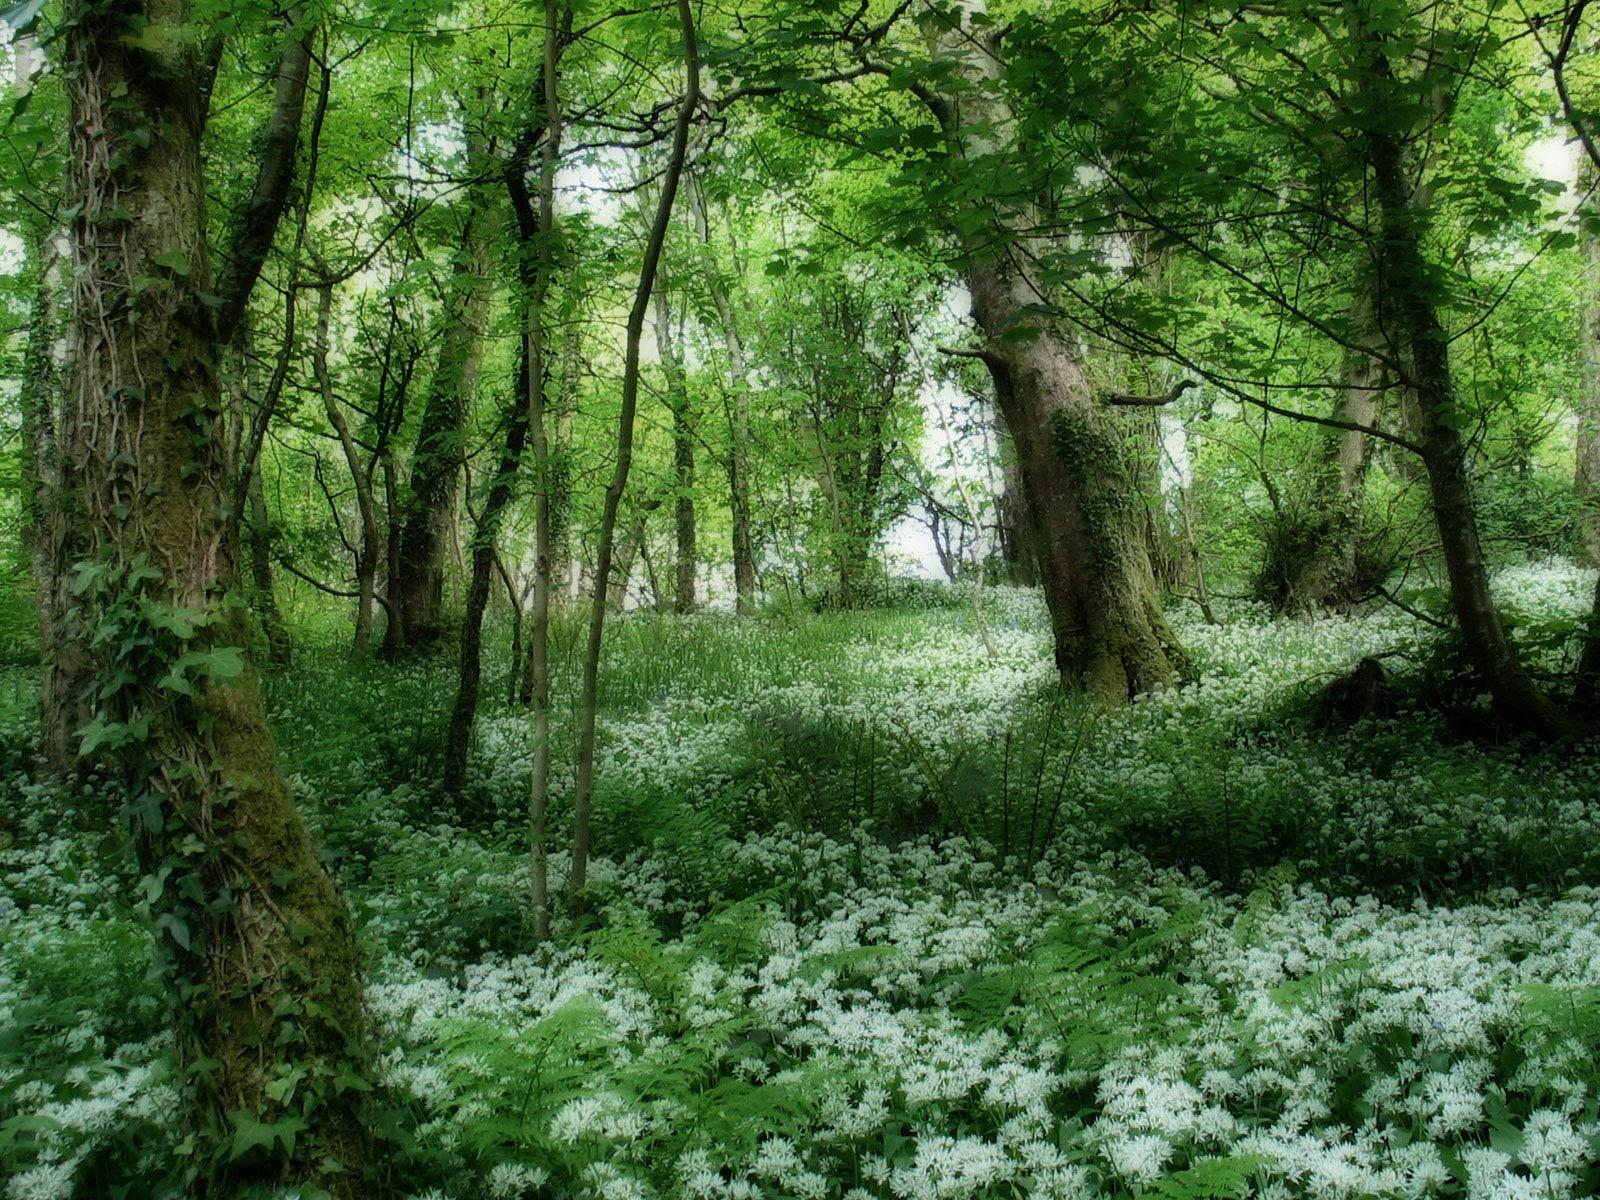 http://1.bp.blogspot.com/_28qSOmcAMsY/S-goYB9ipuI/AAAAAAAAAbo/8xnTD2sbl0Q/s1600/Windows_7_Wallpaper_-_Forest_flowers.jpg